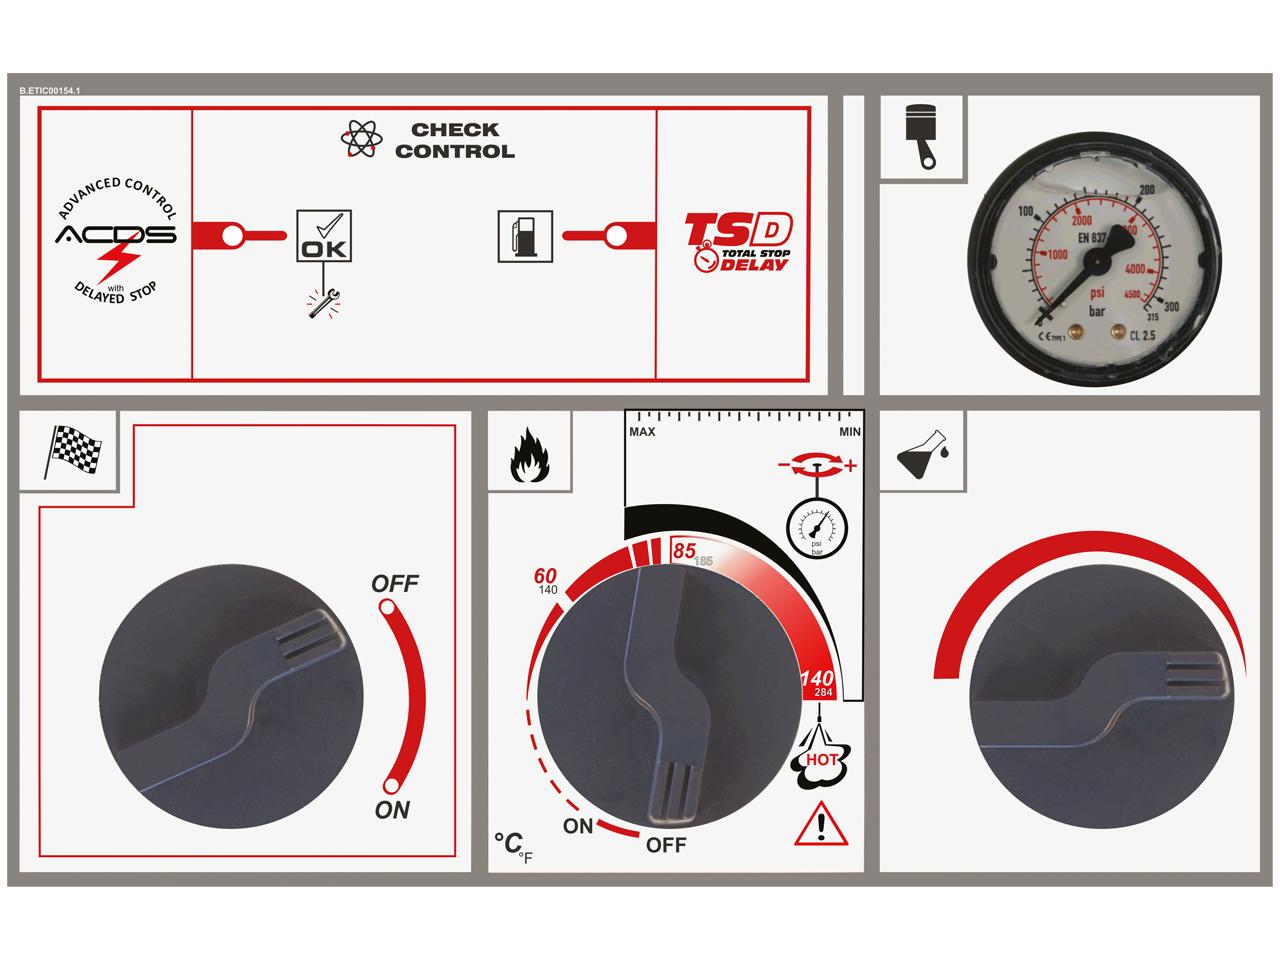 IDROPULITRICI PROFESSIONALI AD ACQUA CALDA PROFESSIONAL HOT WATER HIGH PRESSURE CLEANERS STX3.jpg